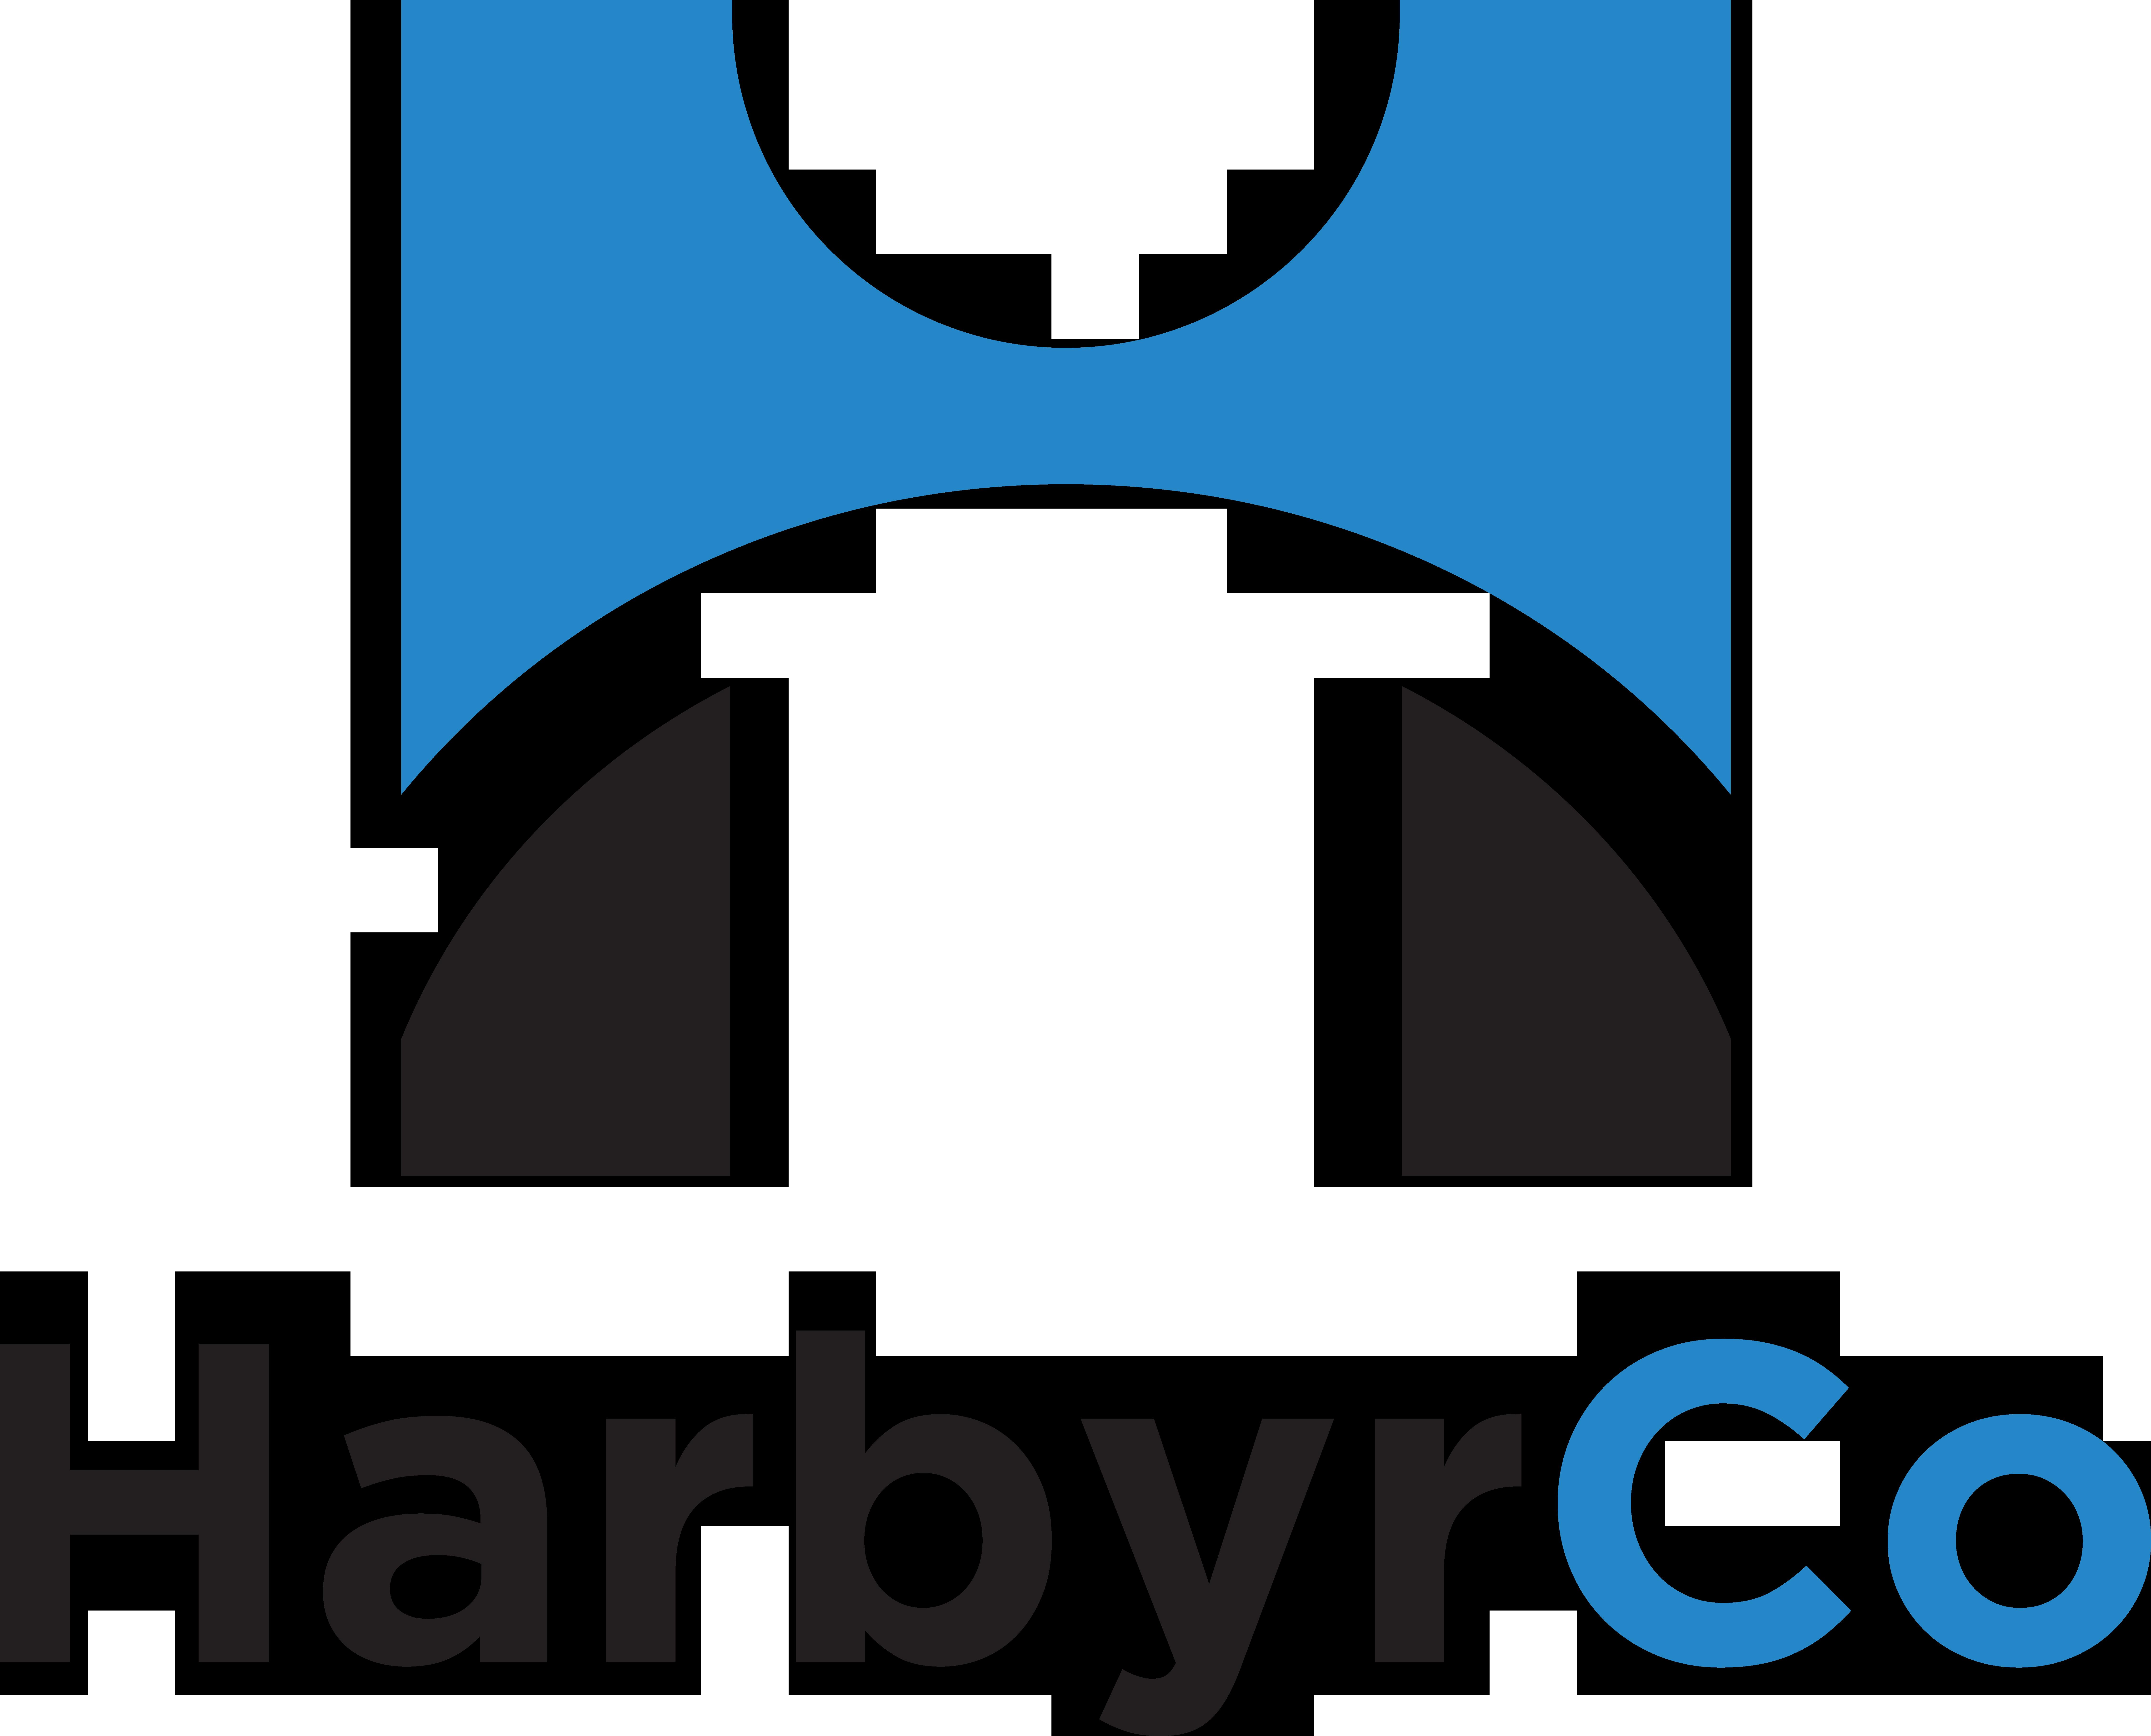 HarbyrCo